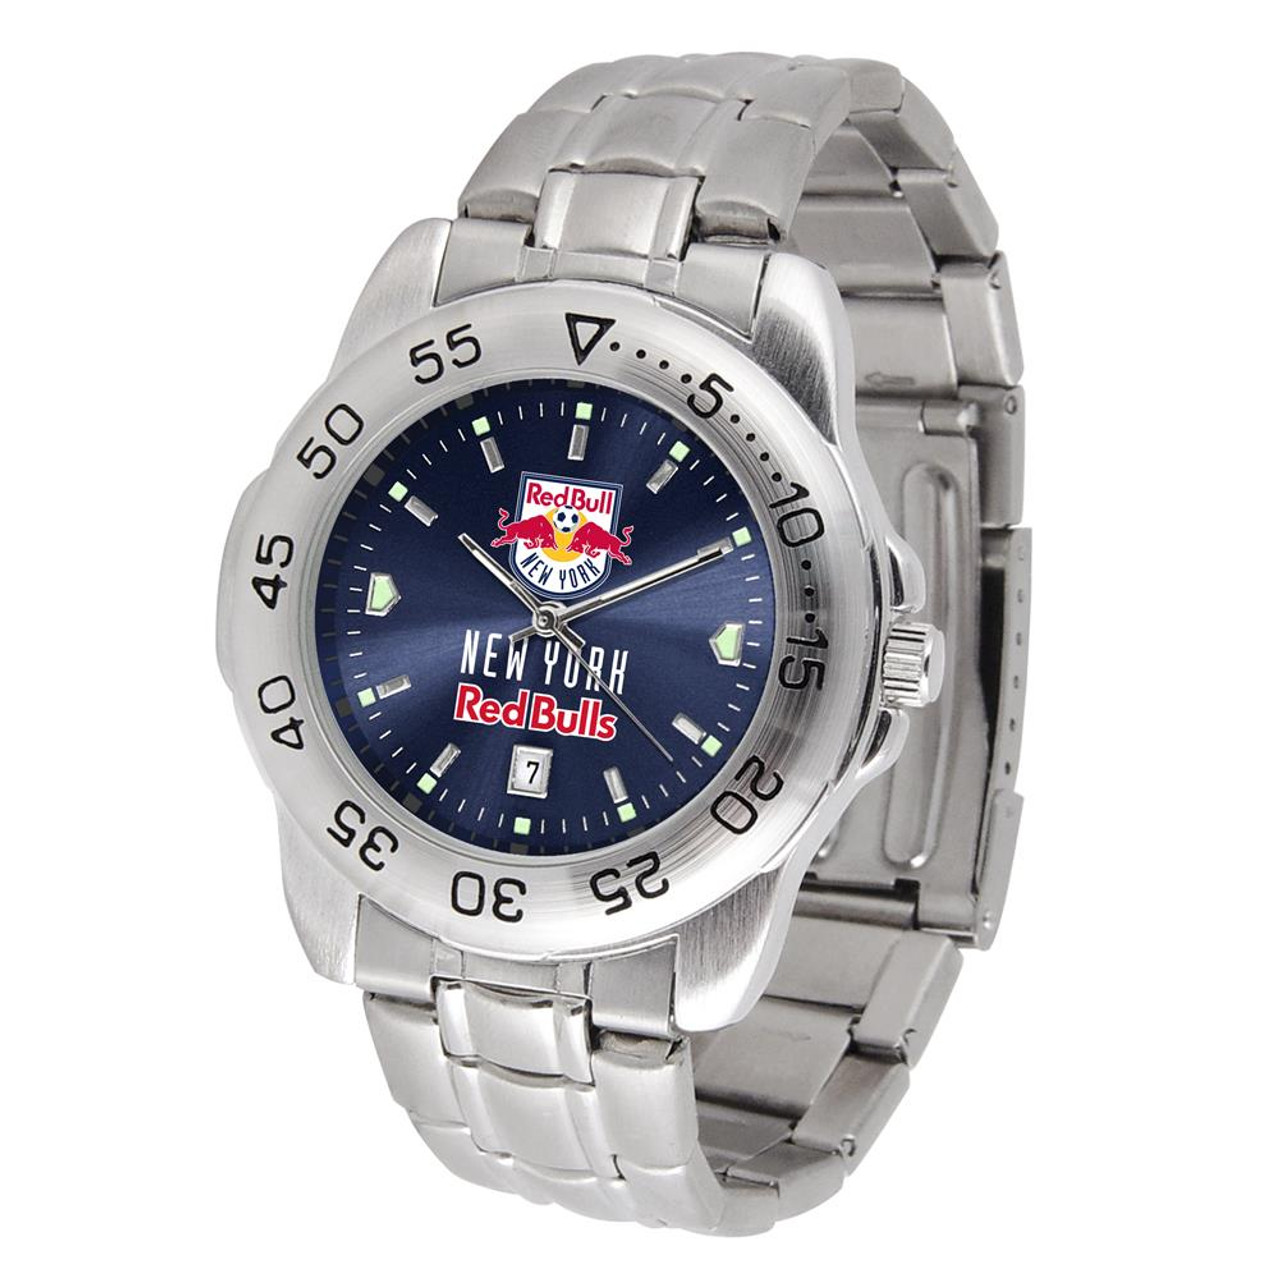 Men's New York Red Bulls Sport Watch Stainless Steel Watch